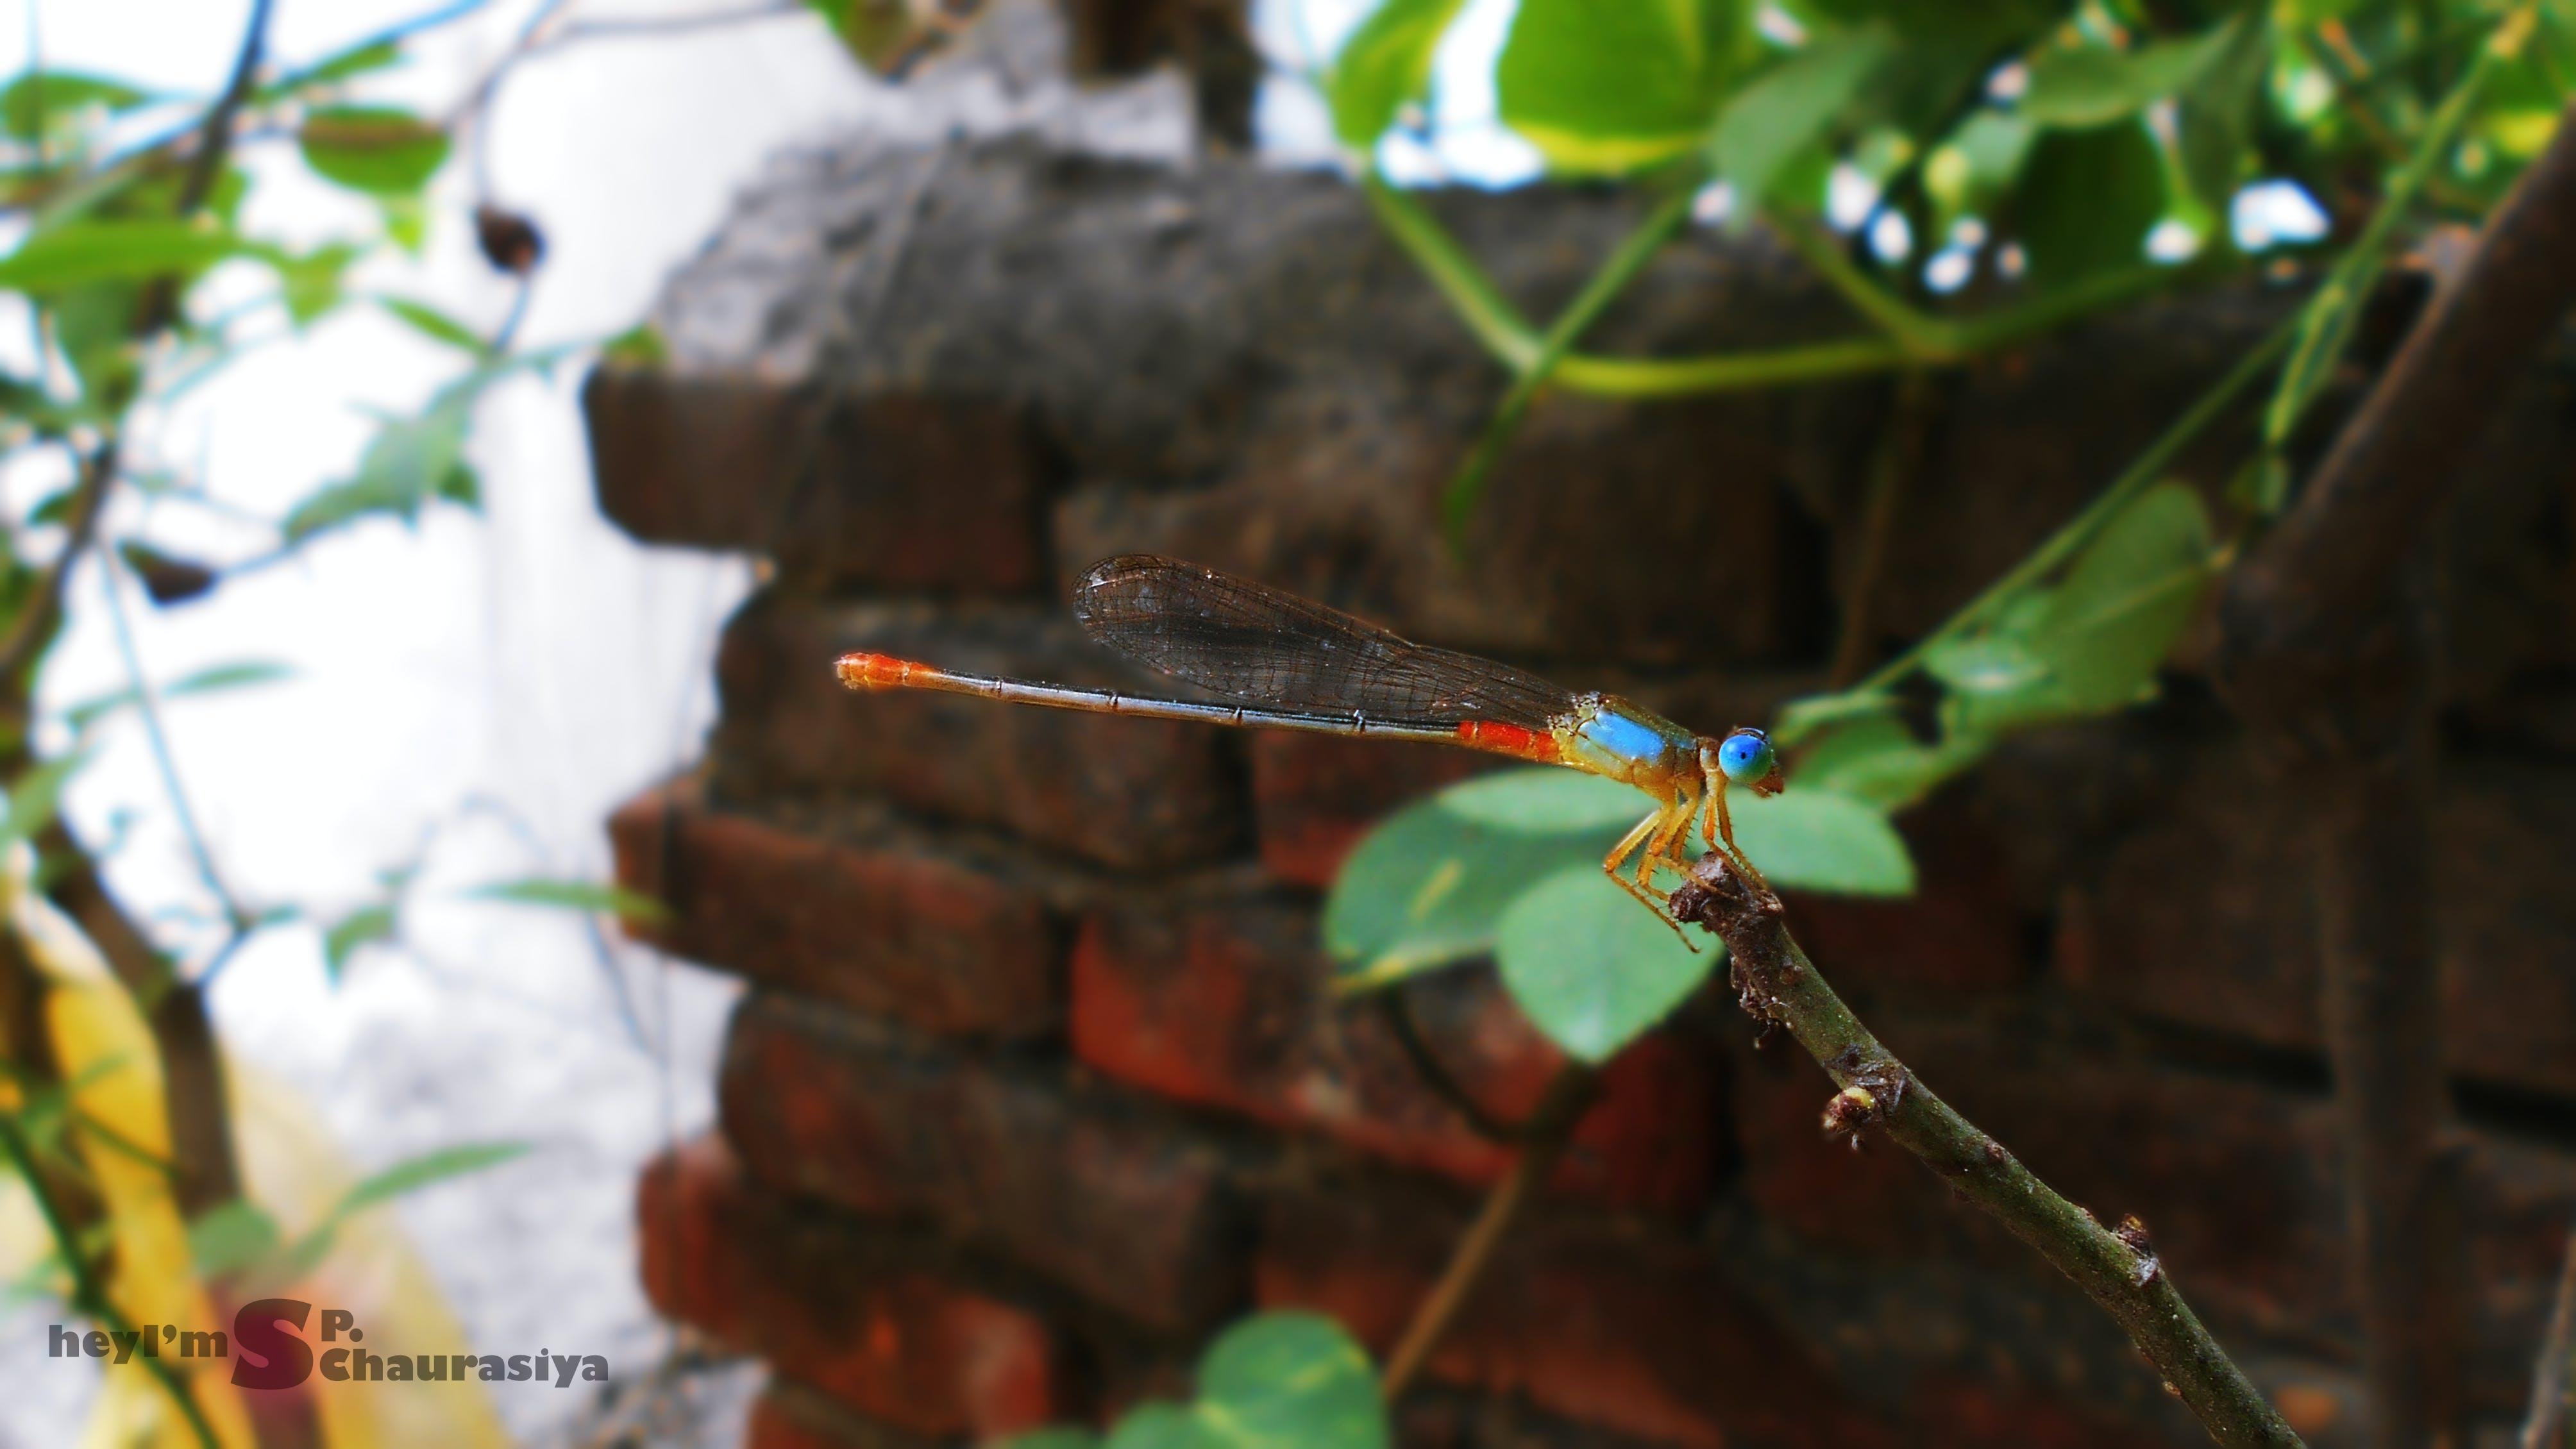 Free stock photo of anamalia, blue insect, brick paving, colourful